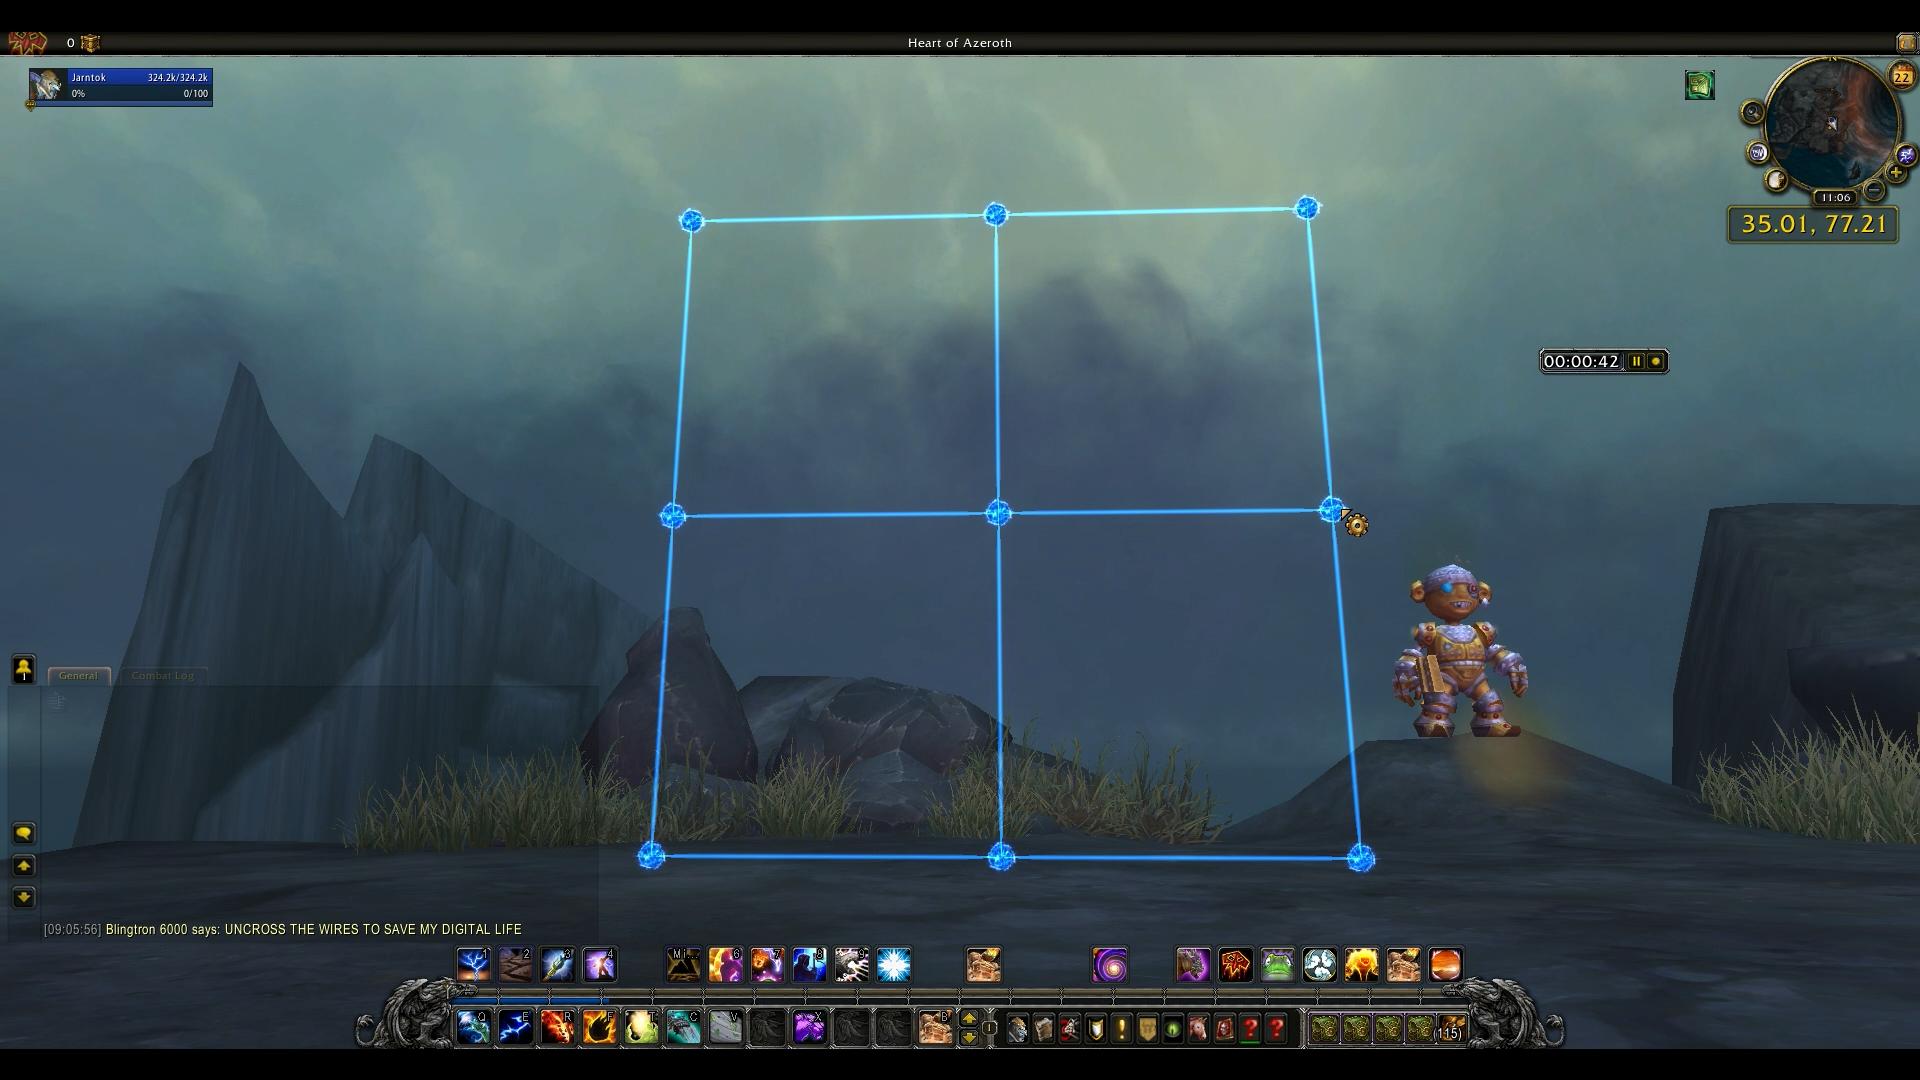 The Shortest Distance Achievement World Of Warcraft Hot Wiring Games 4 3x3 Square